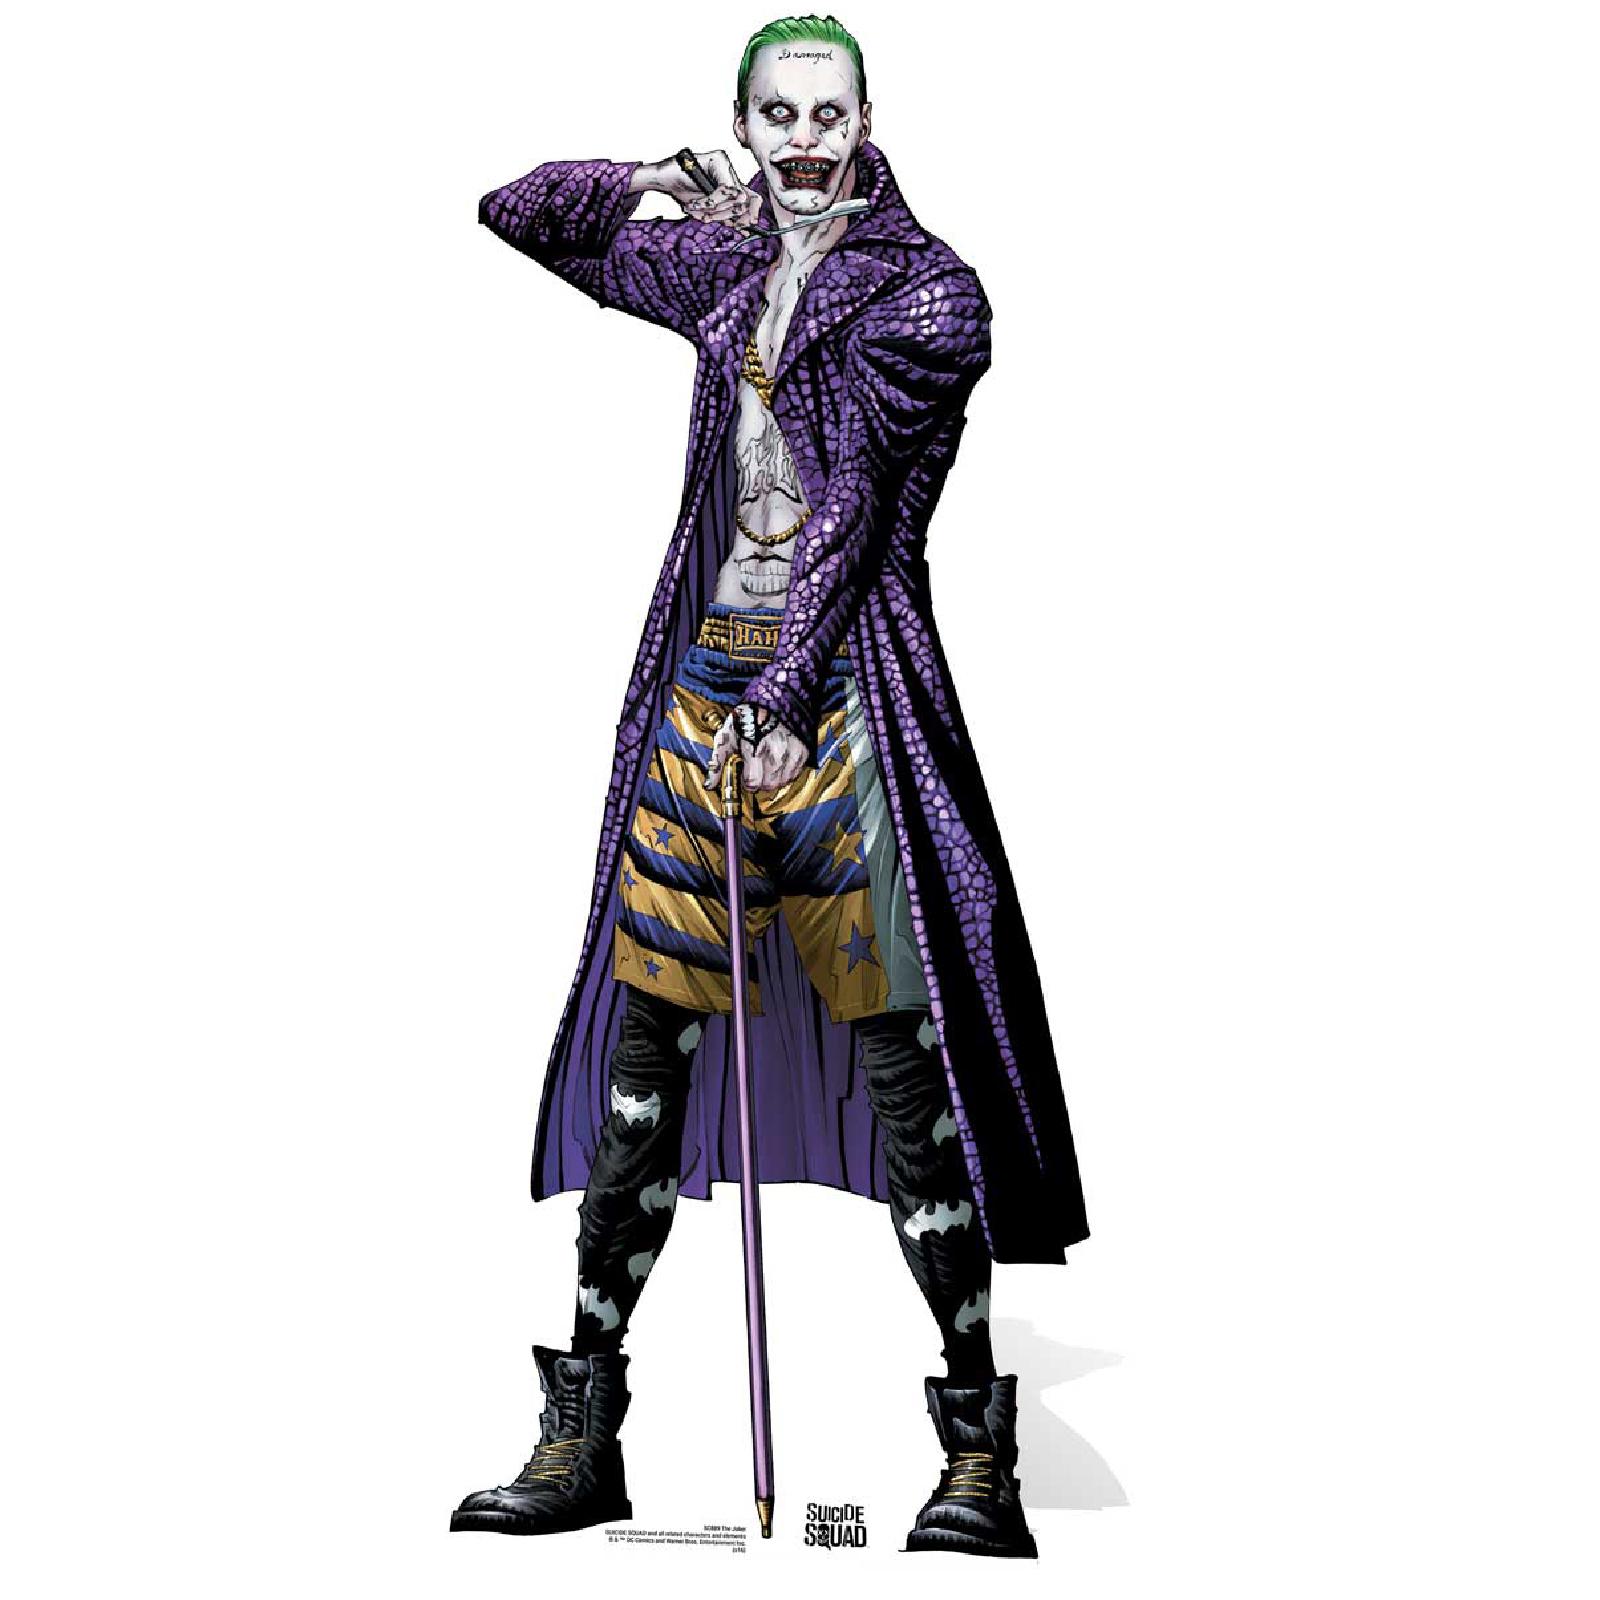 Suicide Squad Joker Halloween Costume.Suicide Squad The Joker Comic Artwork Cutout